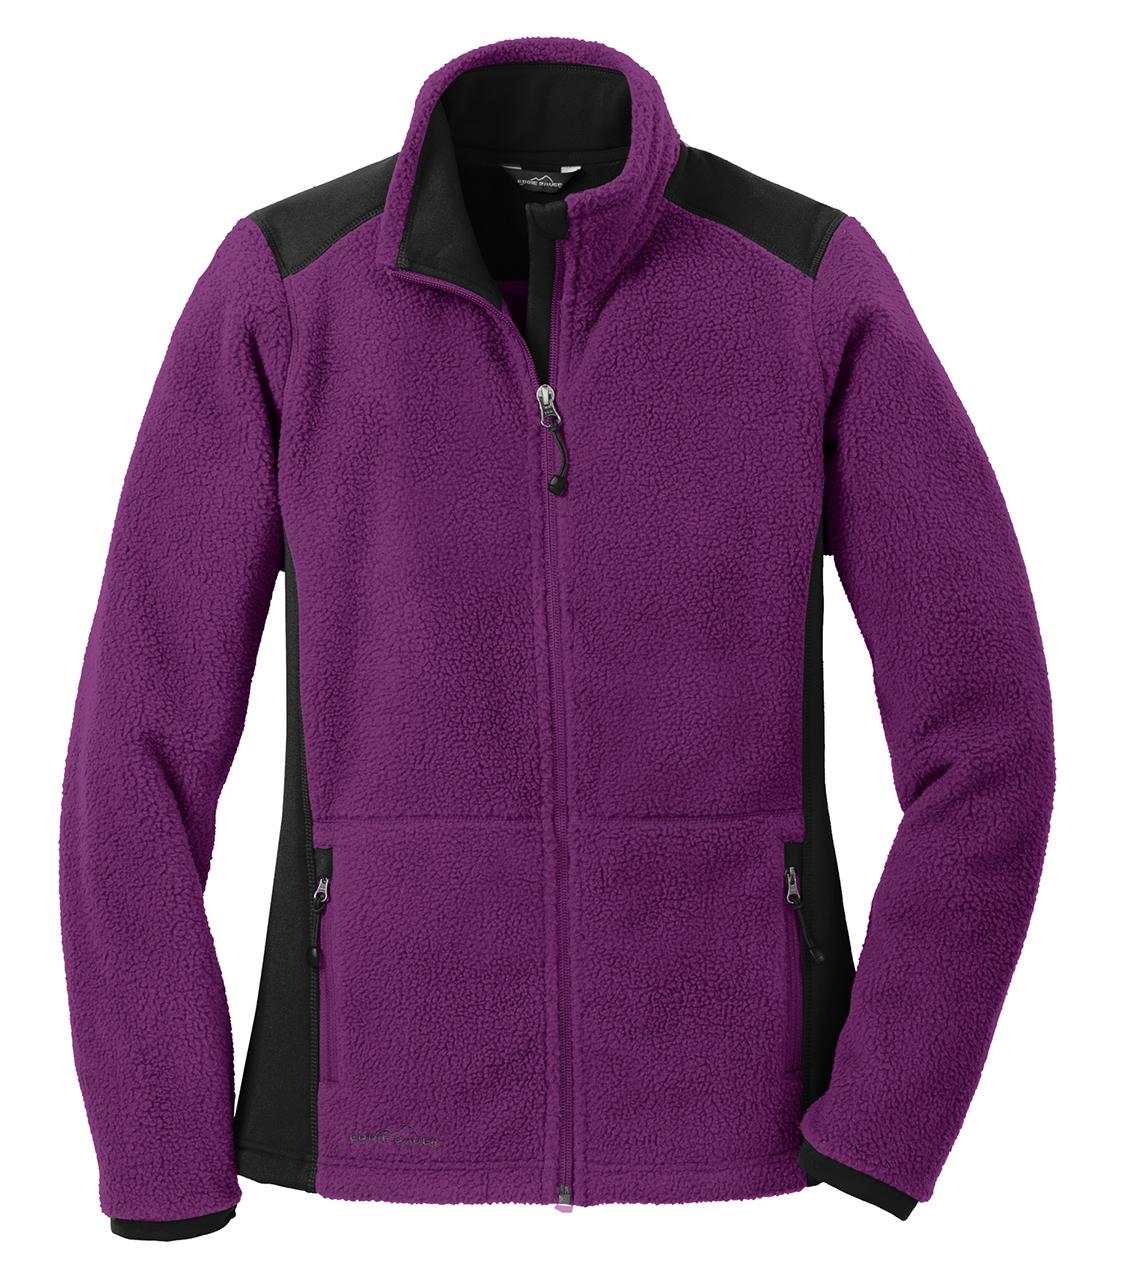 Picture of Eddie Bauer Sherpa Full Zip Fleece Ladies' Jacket